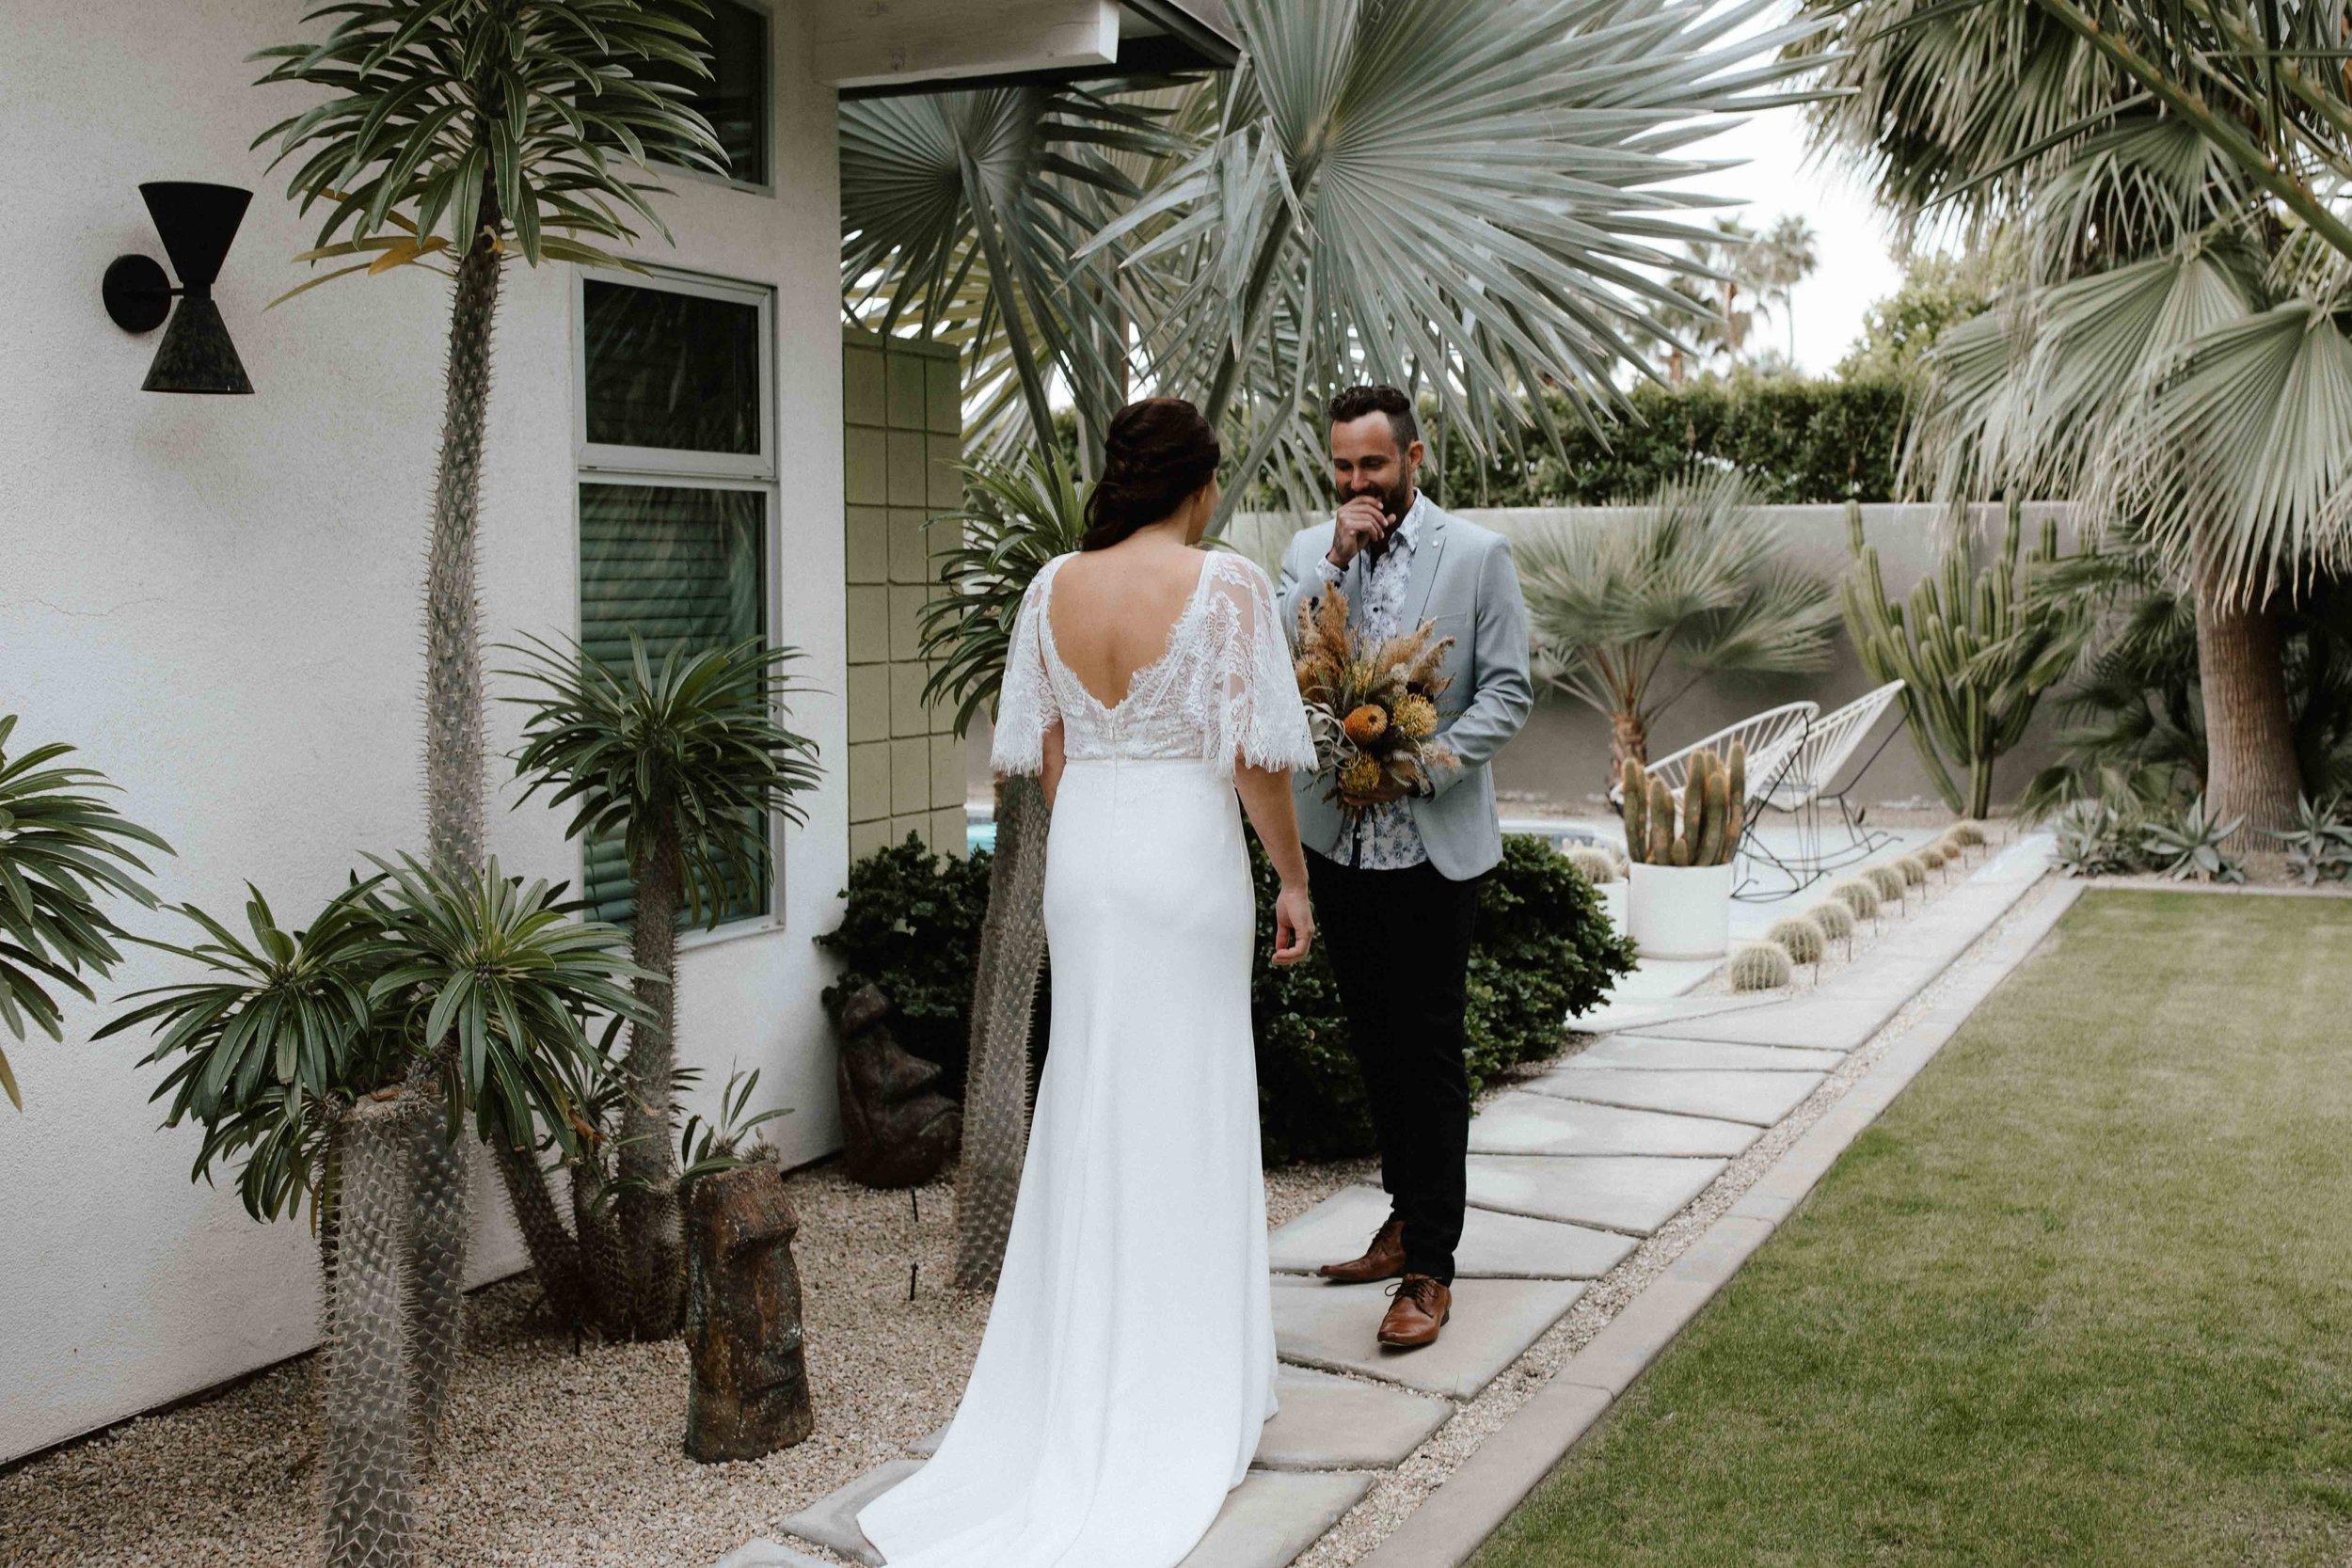 America Joshua Tree Palm Springs Elopement wedding-16.jpg